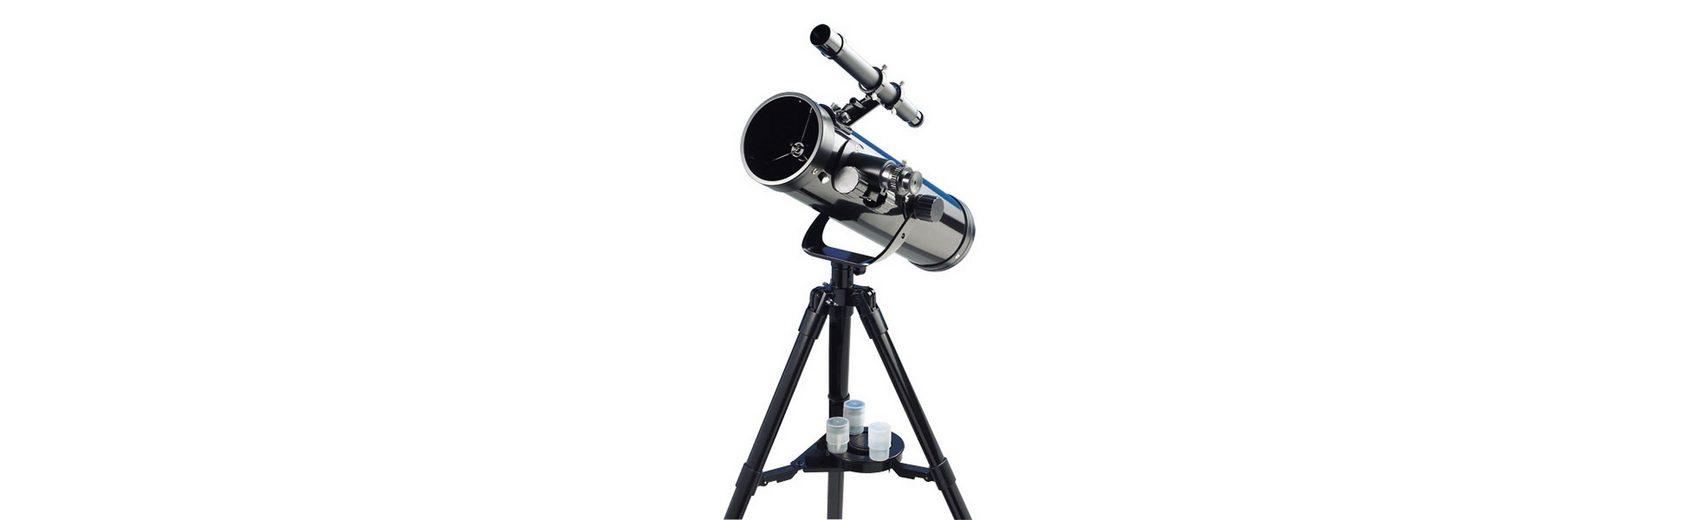 Edu-Toys Reflektorteleskop 167x